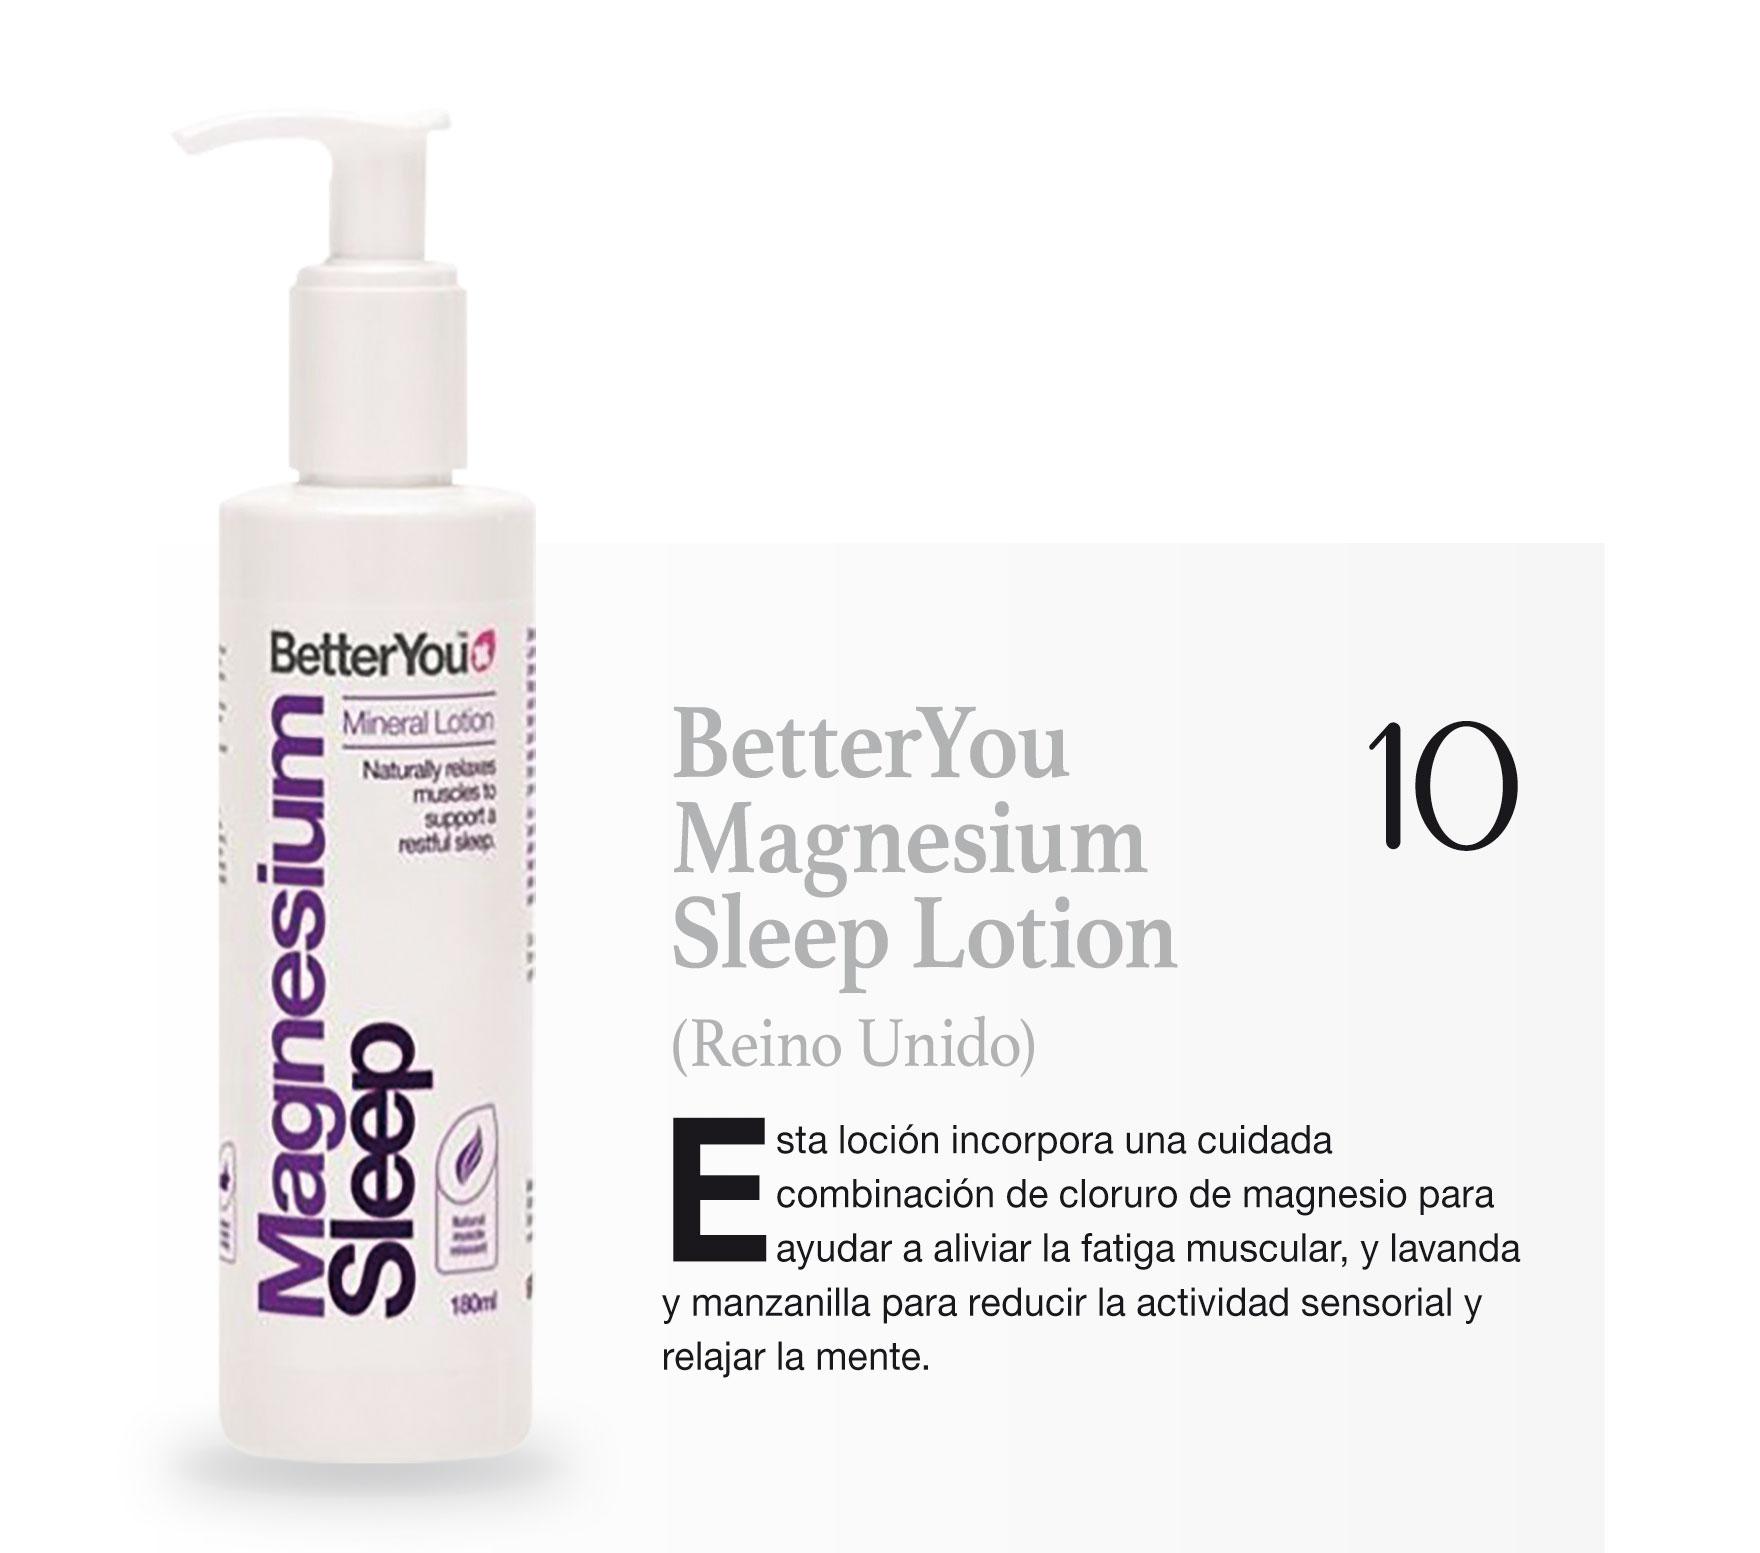 BetterYou Magnesium Sleep Lotion (Reino Unido)